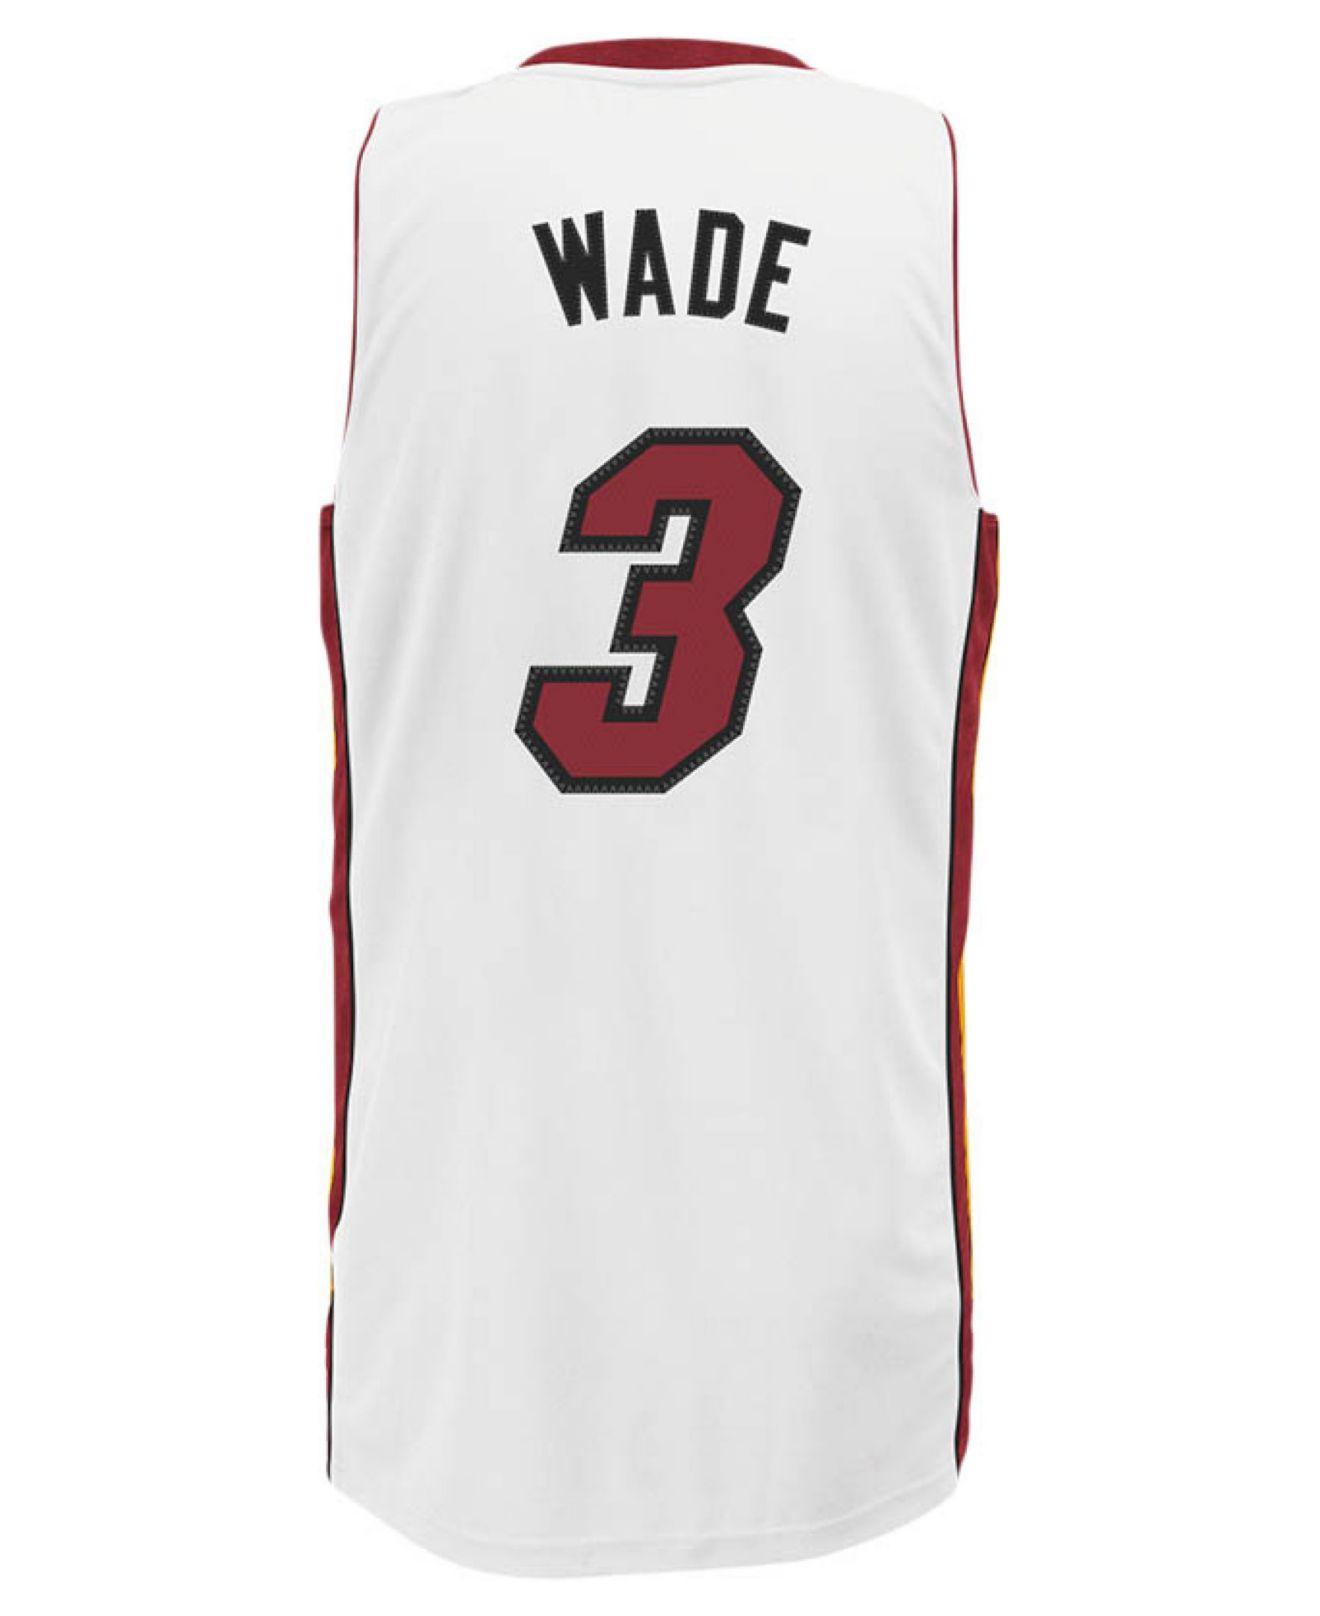 free shipping 0fb7e 14cf1 Adidas Originals White Men's Miami Heat Dwyane Wade Jersey for men